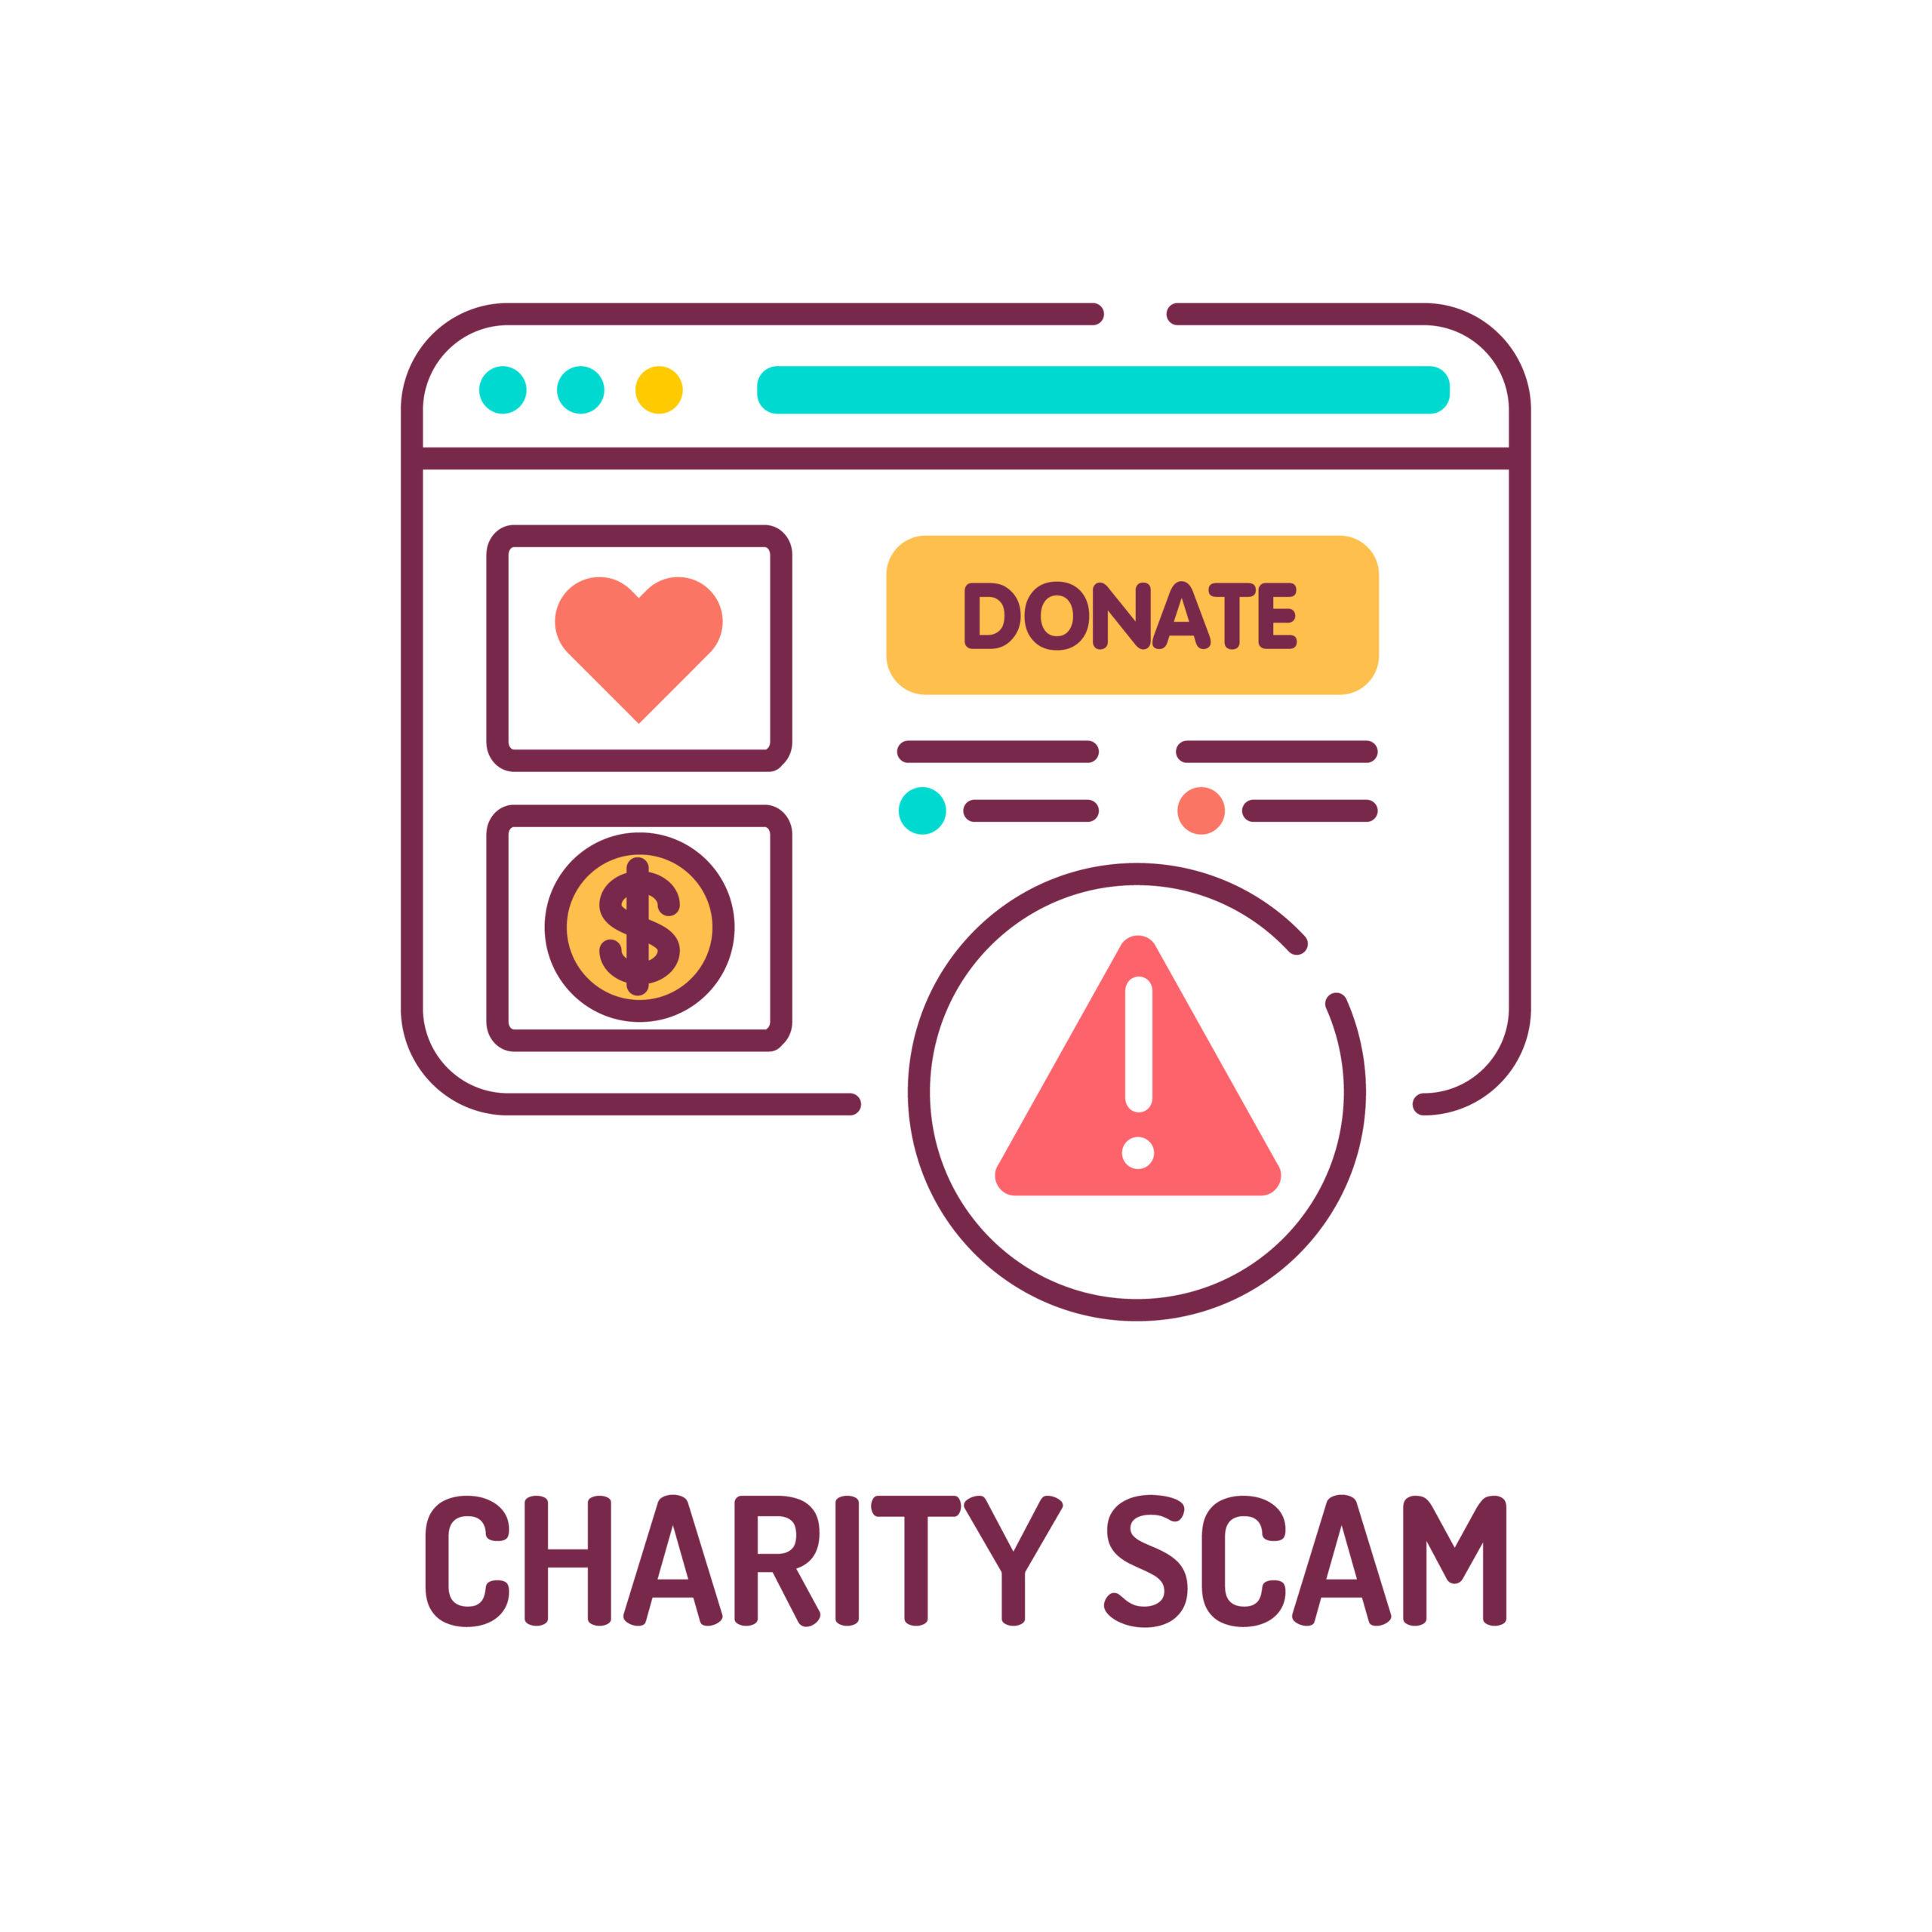 Charity Scam Color Line Icon. Cybercrime. Fake Donation. Pictogram For Web Page, Mobile App, Promo. Ui Ux Gui Design Element. Editable Stroke.